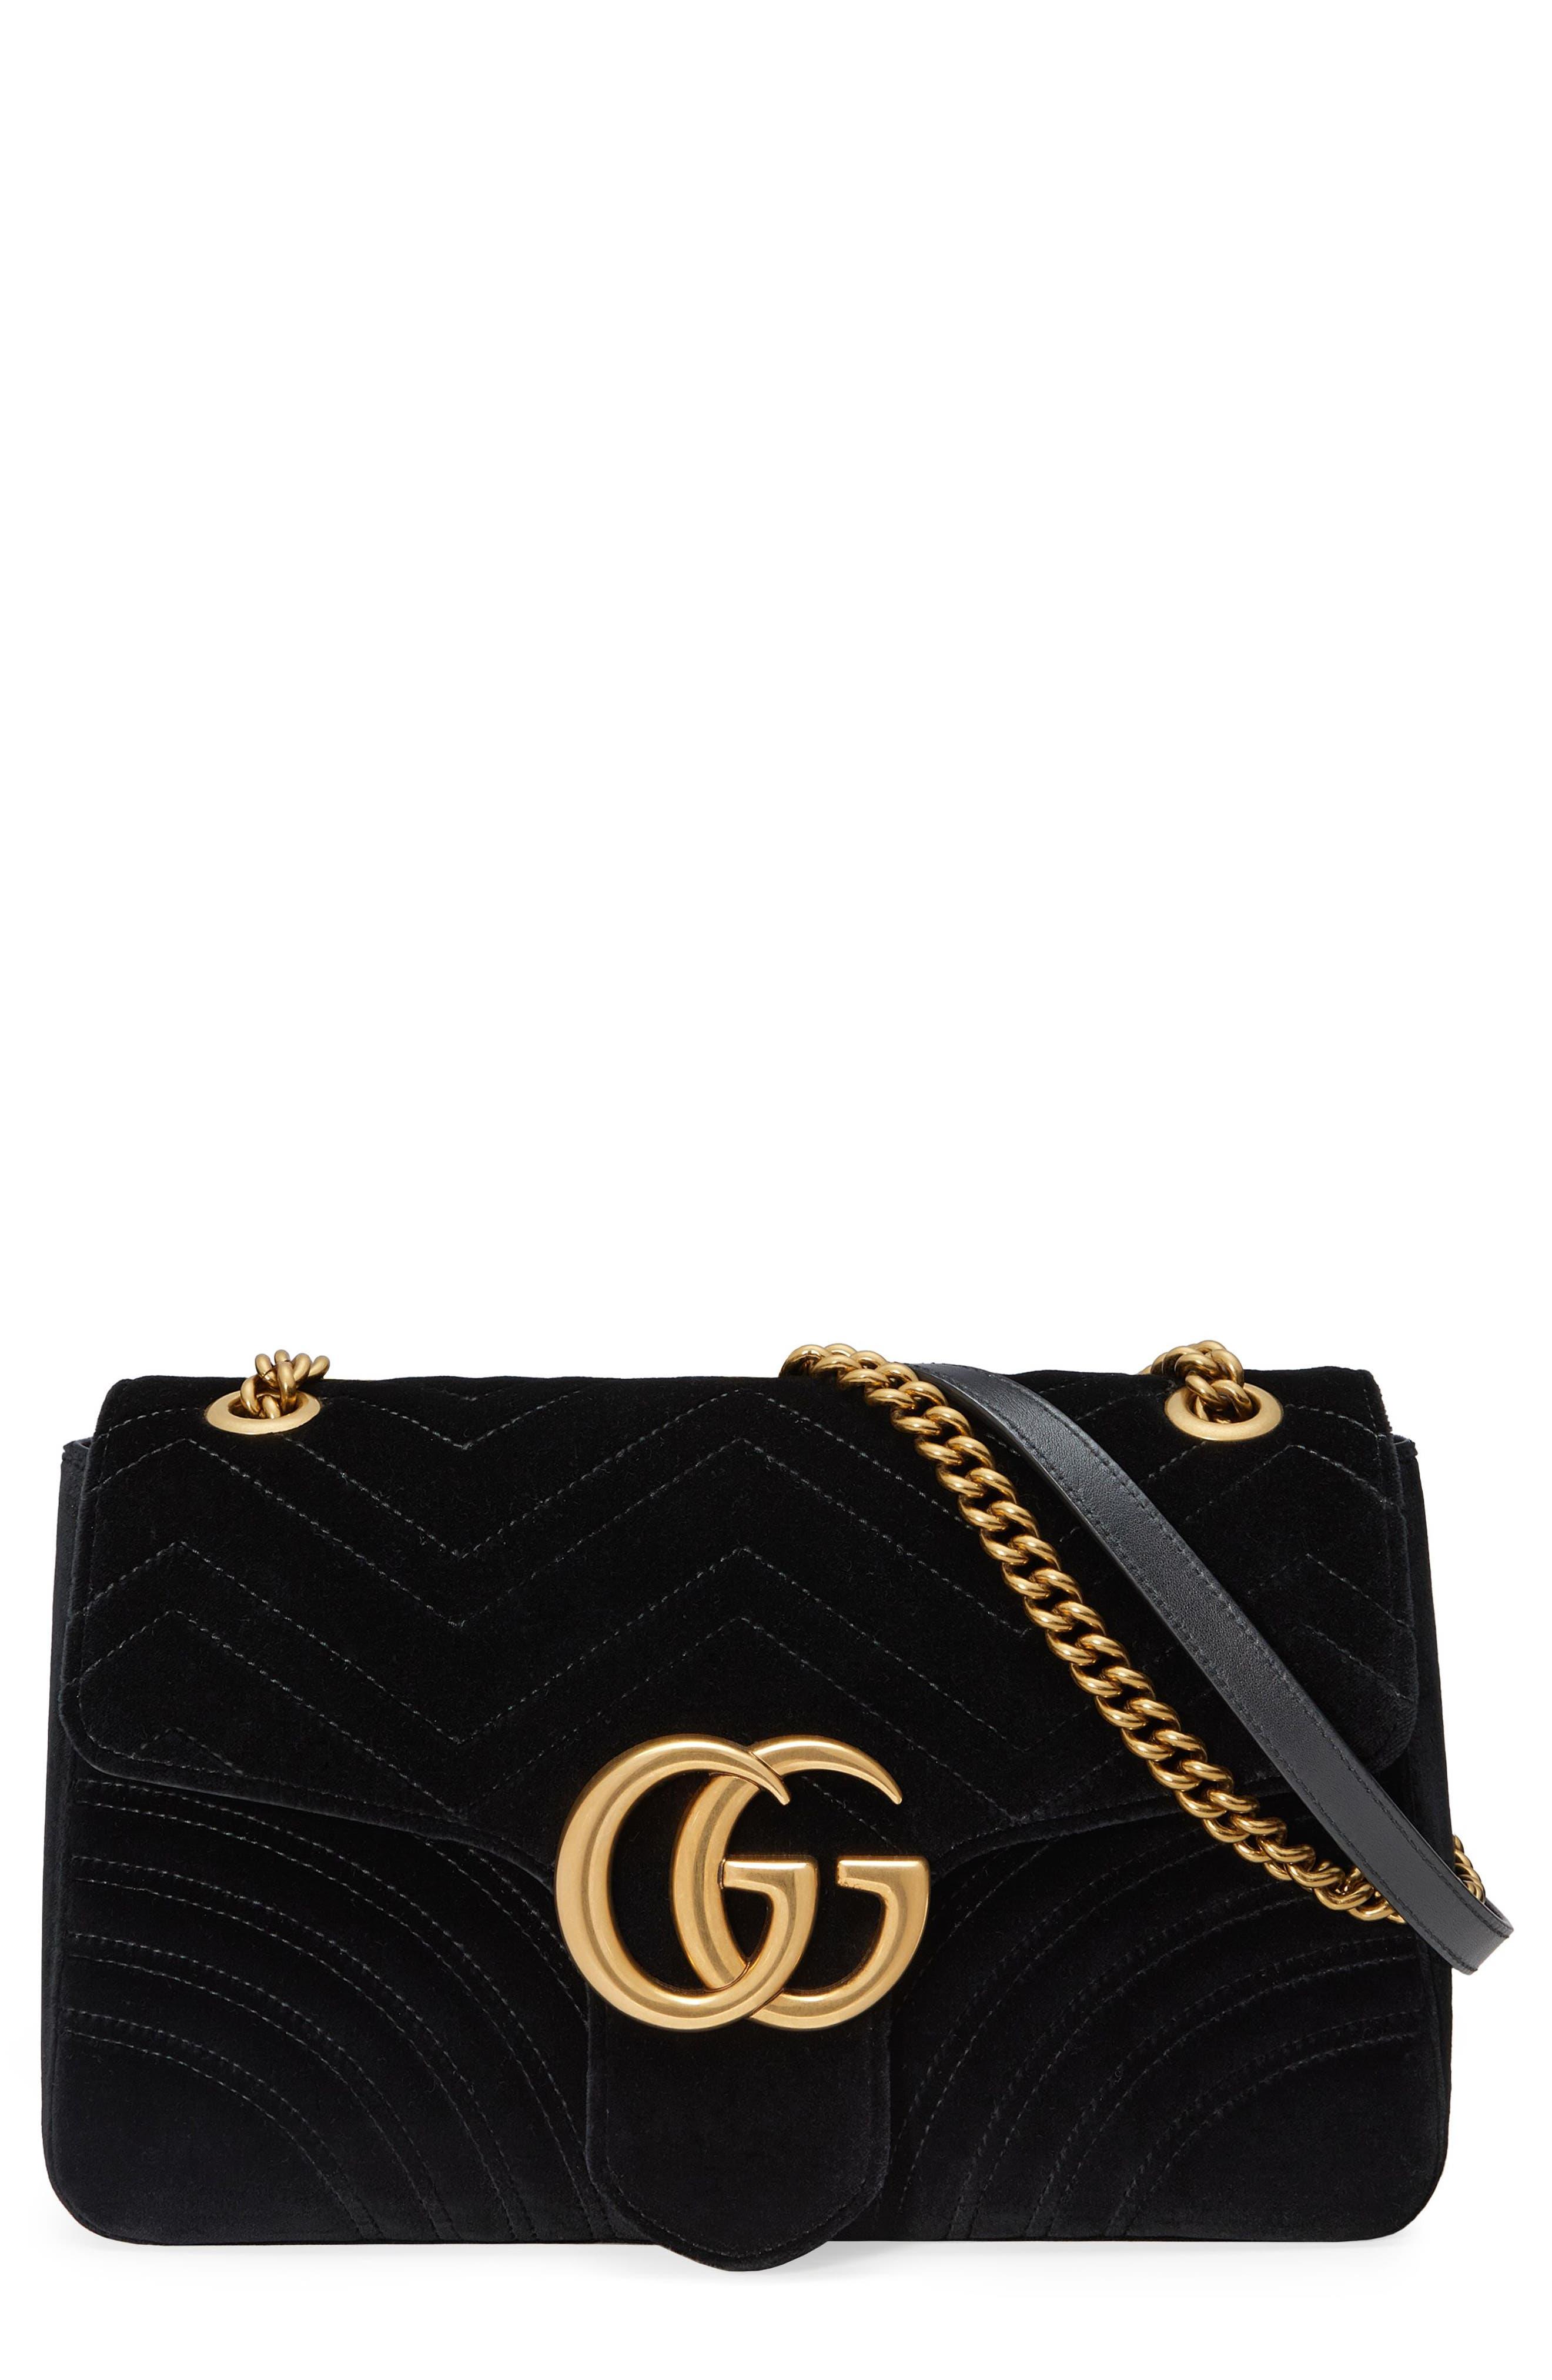 Alternate Image 1 Selected - Gucci Medium GG Marmont 2.0 Matelassé Velvet Shoulder Bag